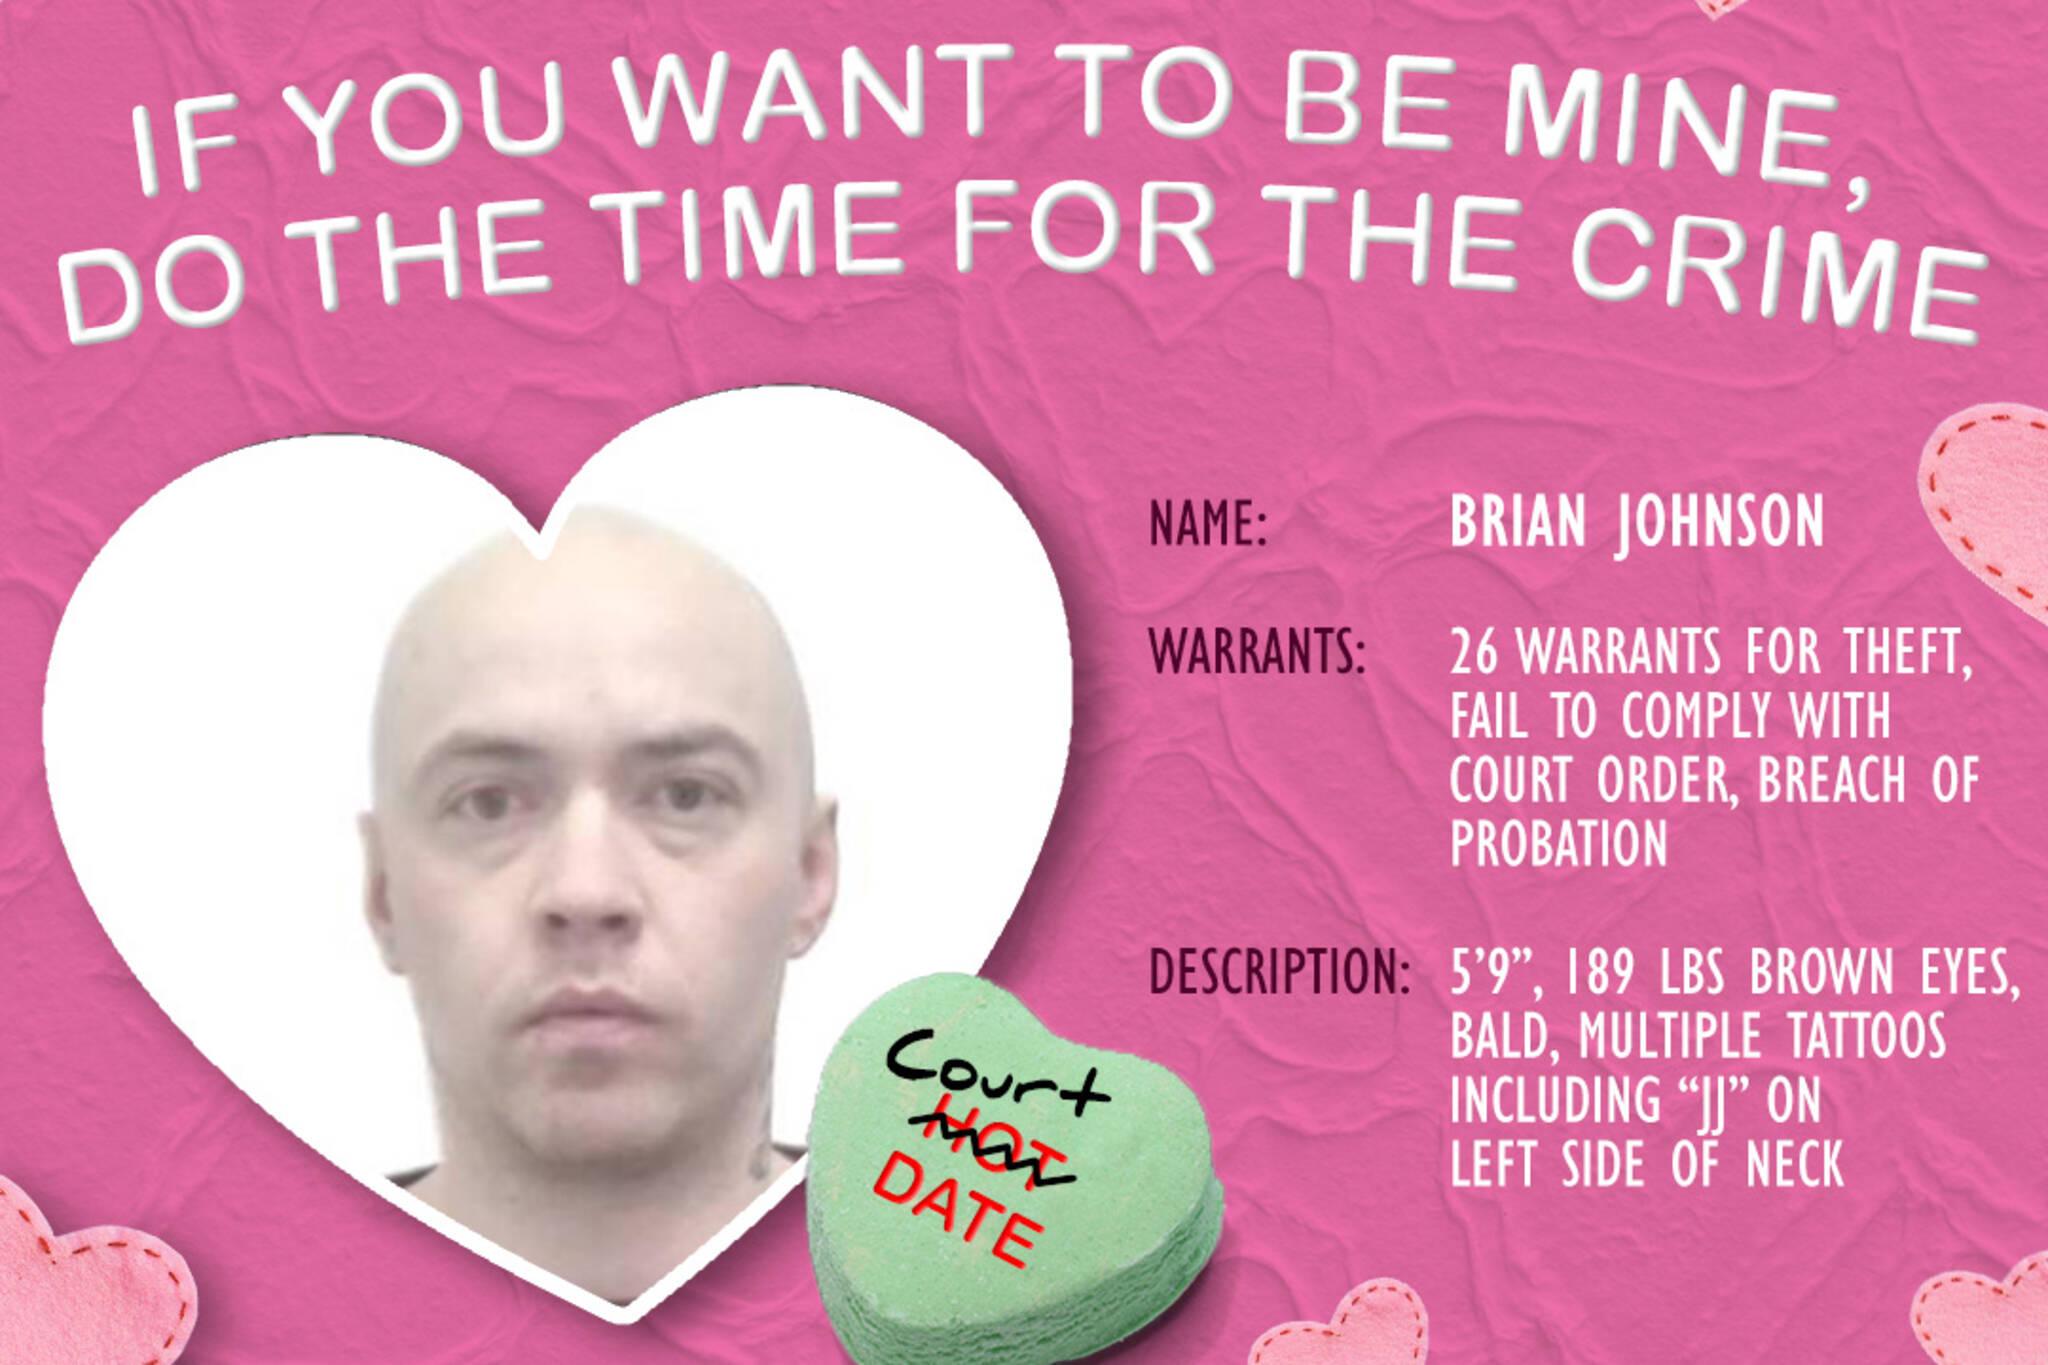 calgary police valentine's